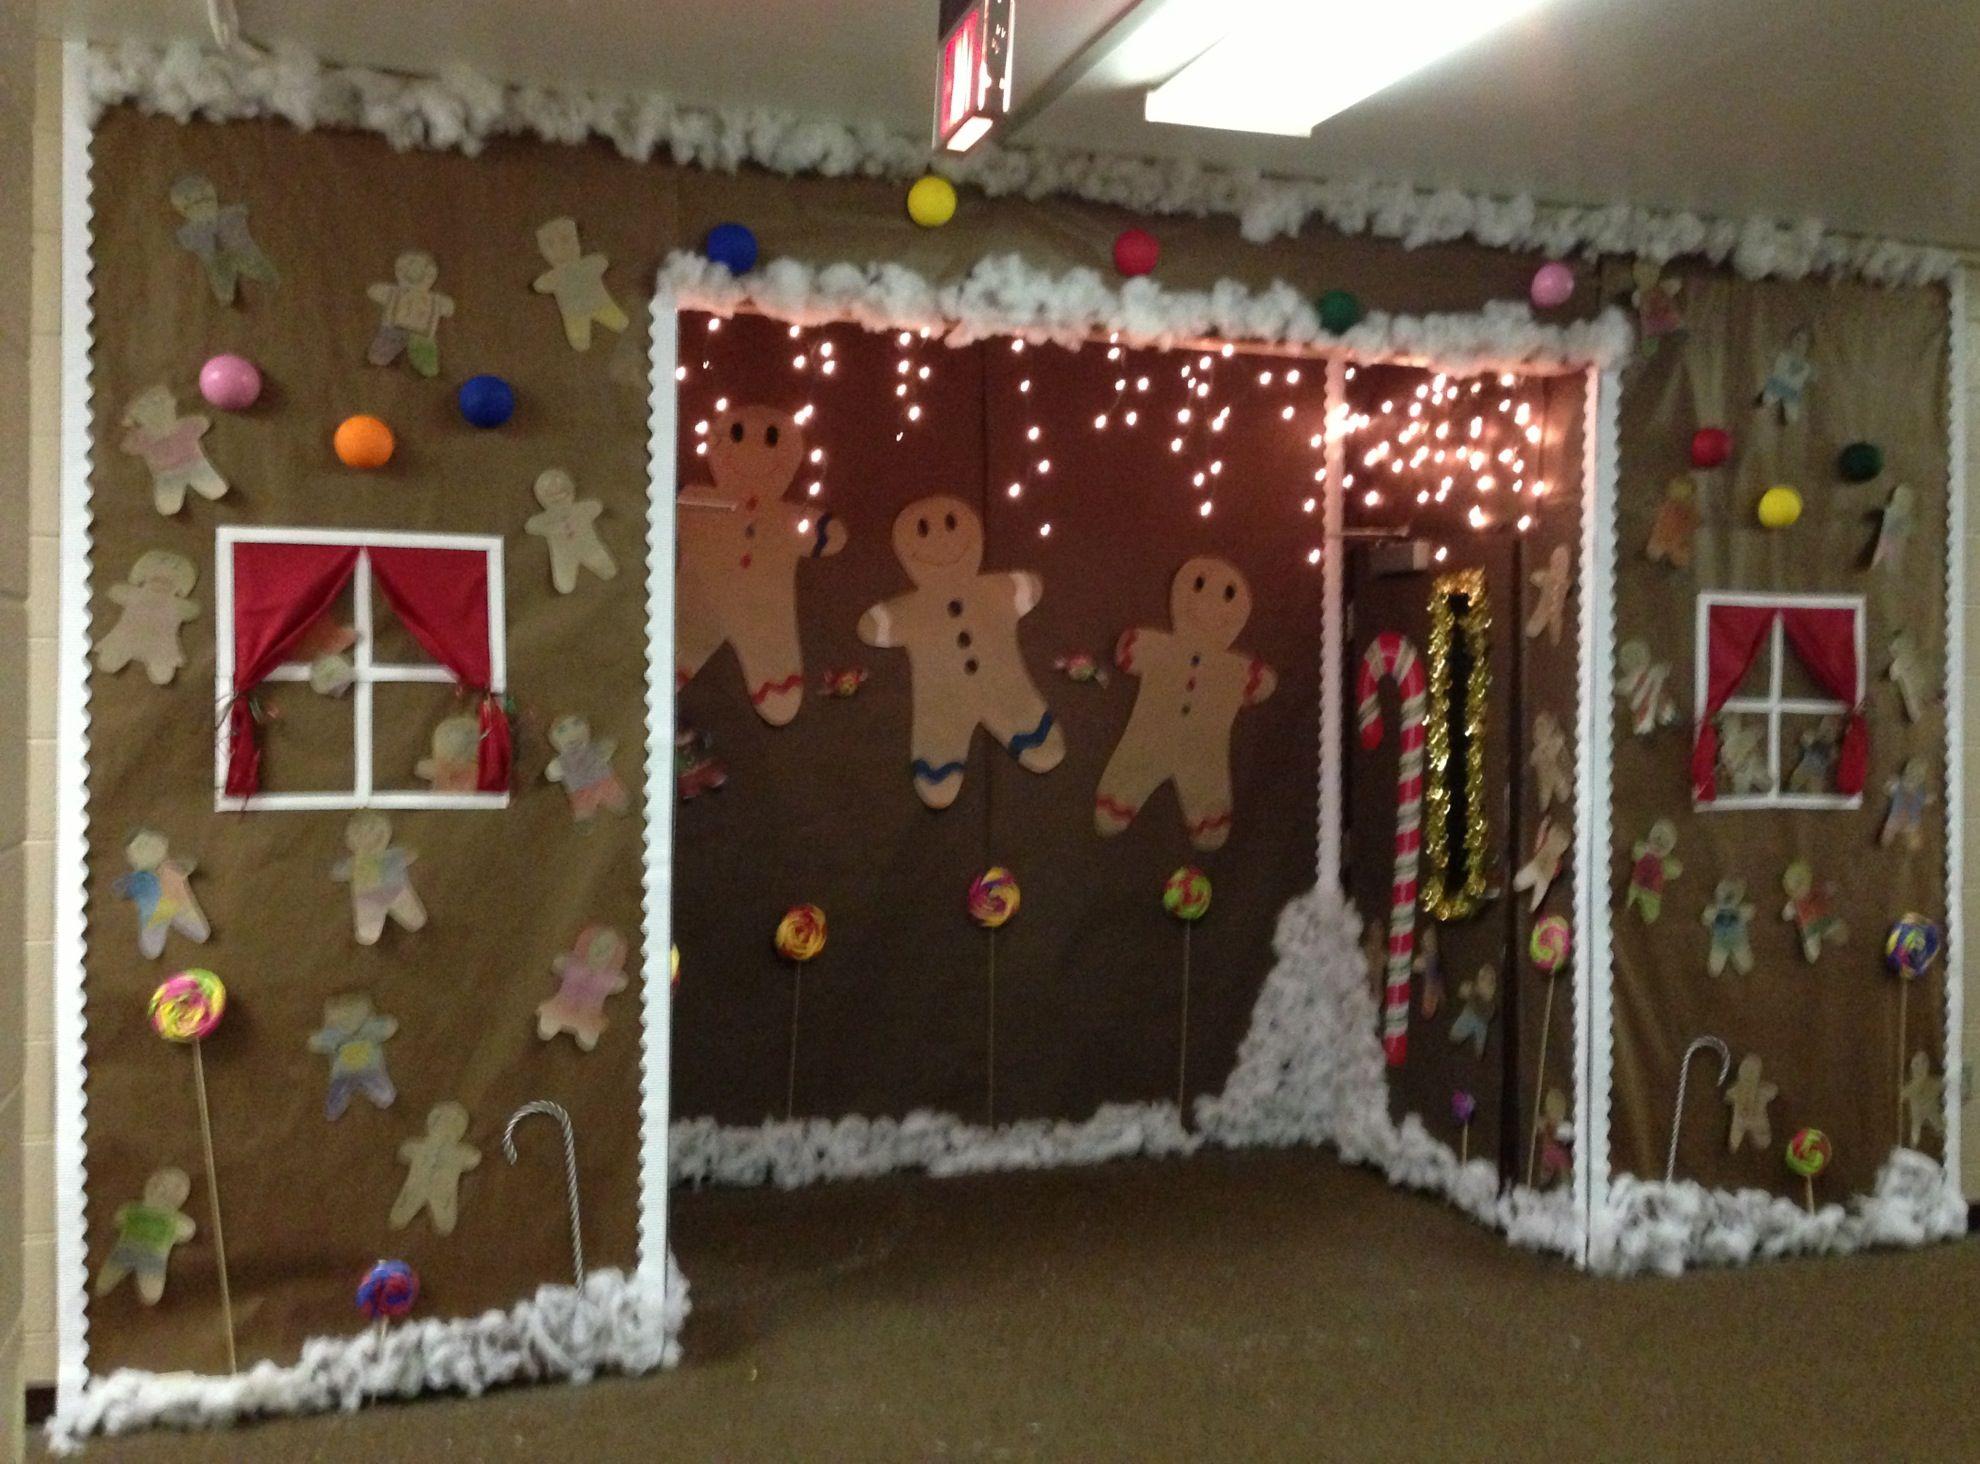 Gingerbread house for decorate your door contest. | School ...